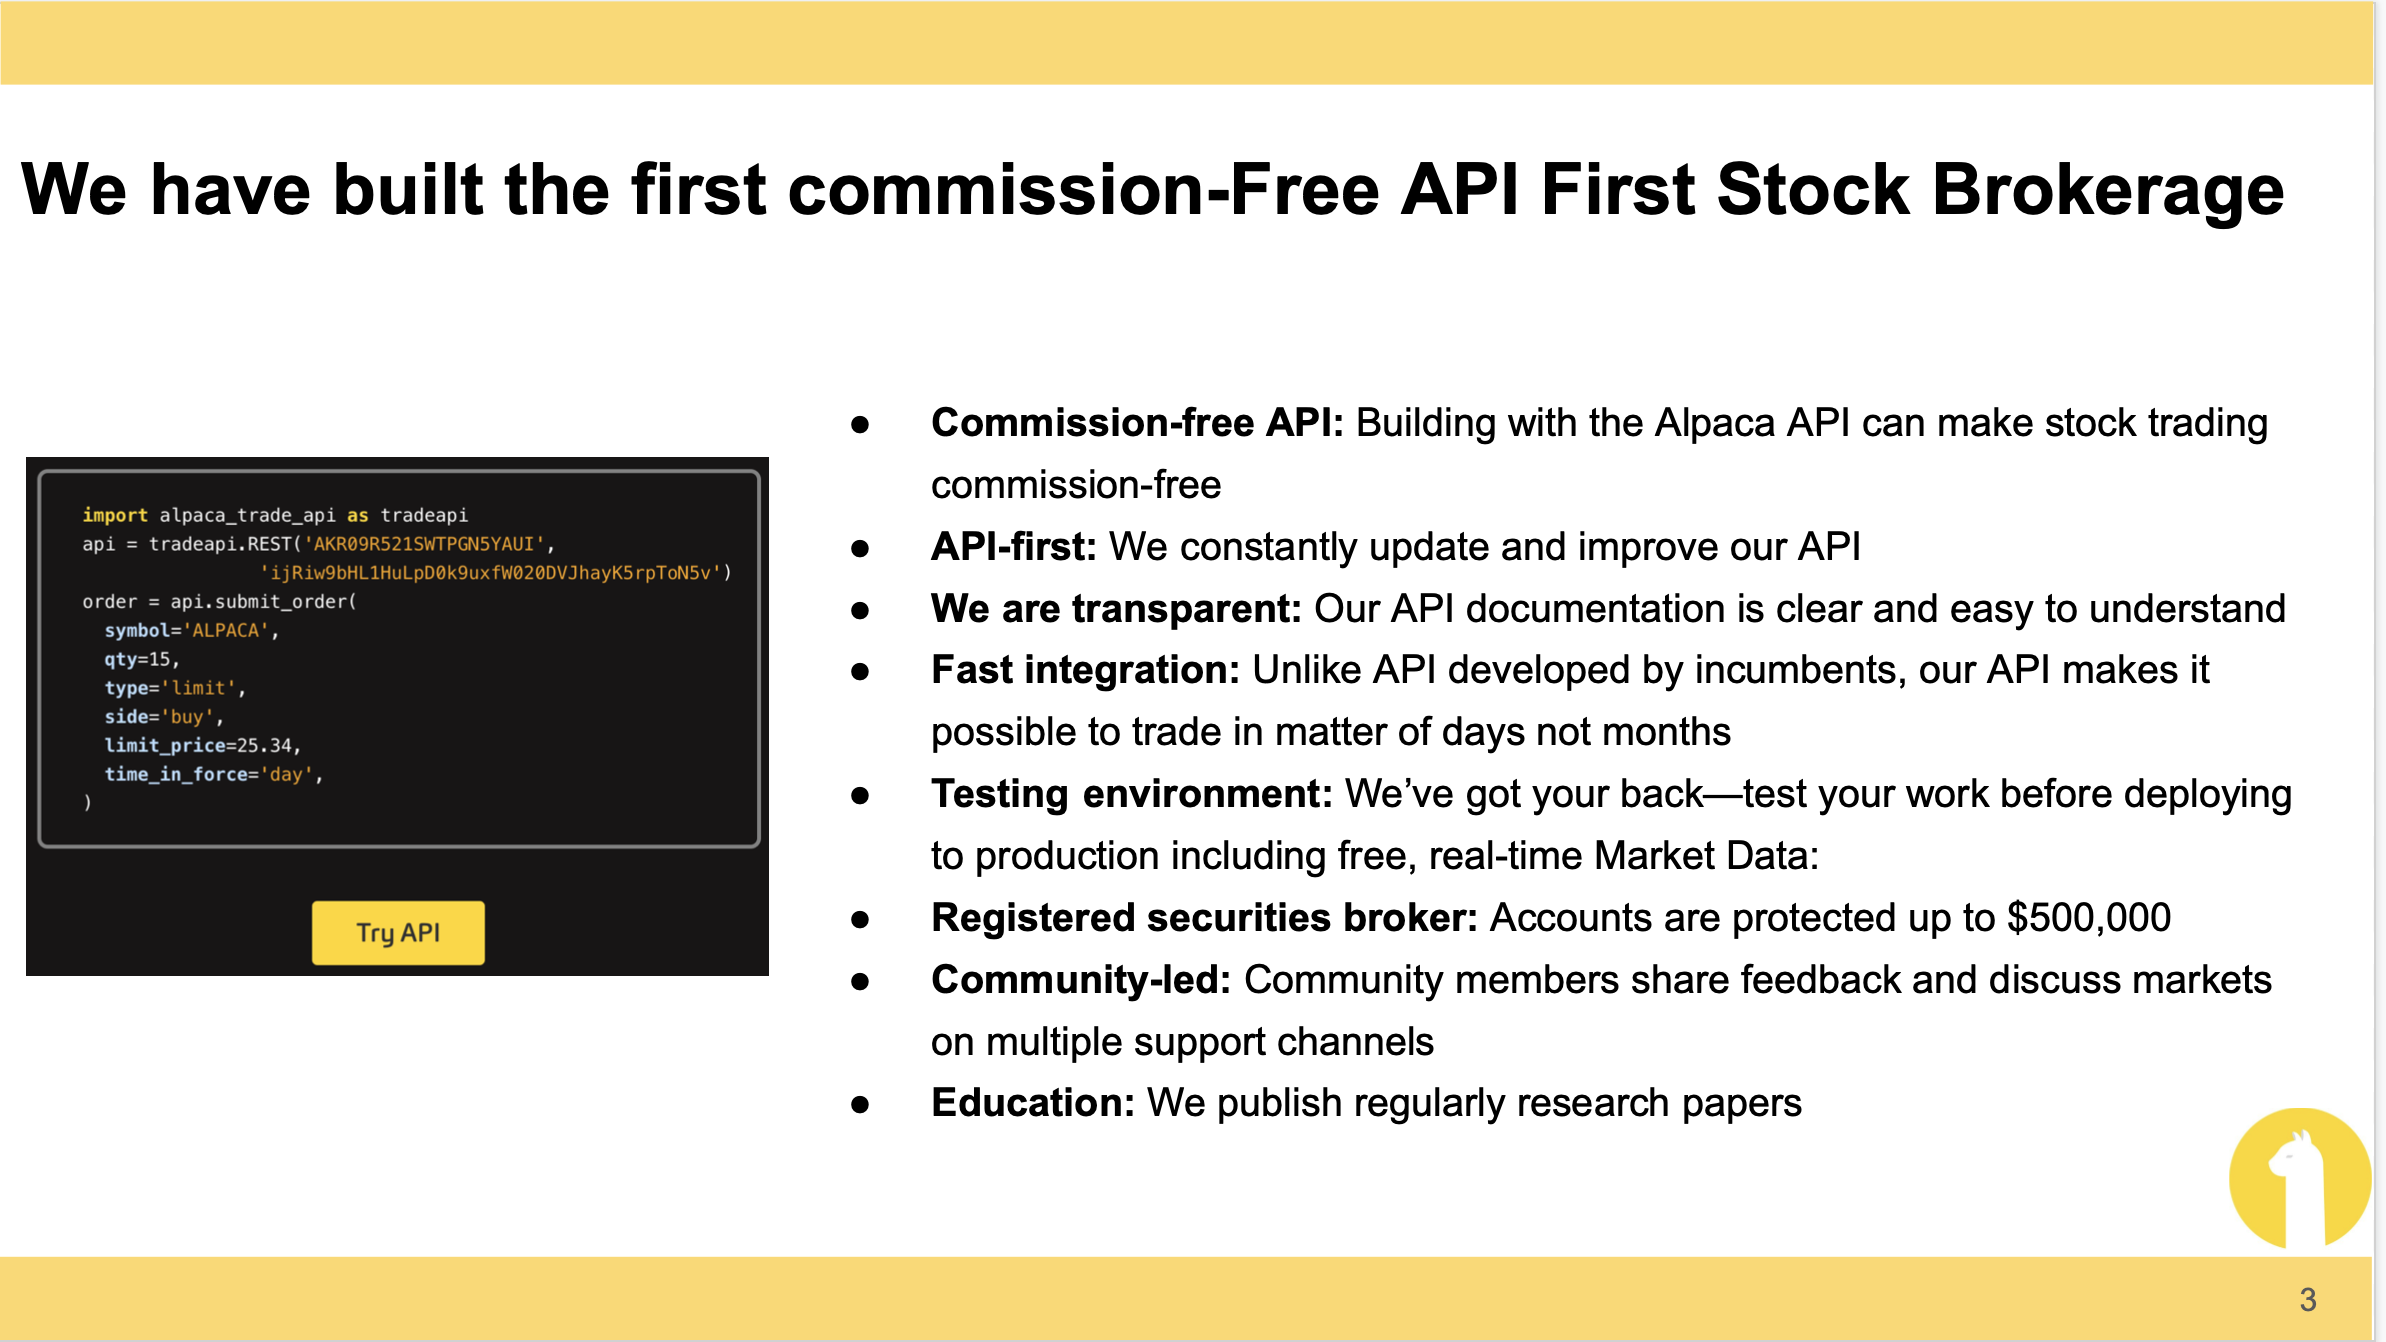 Alpaca API and features